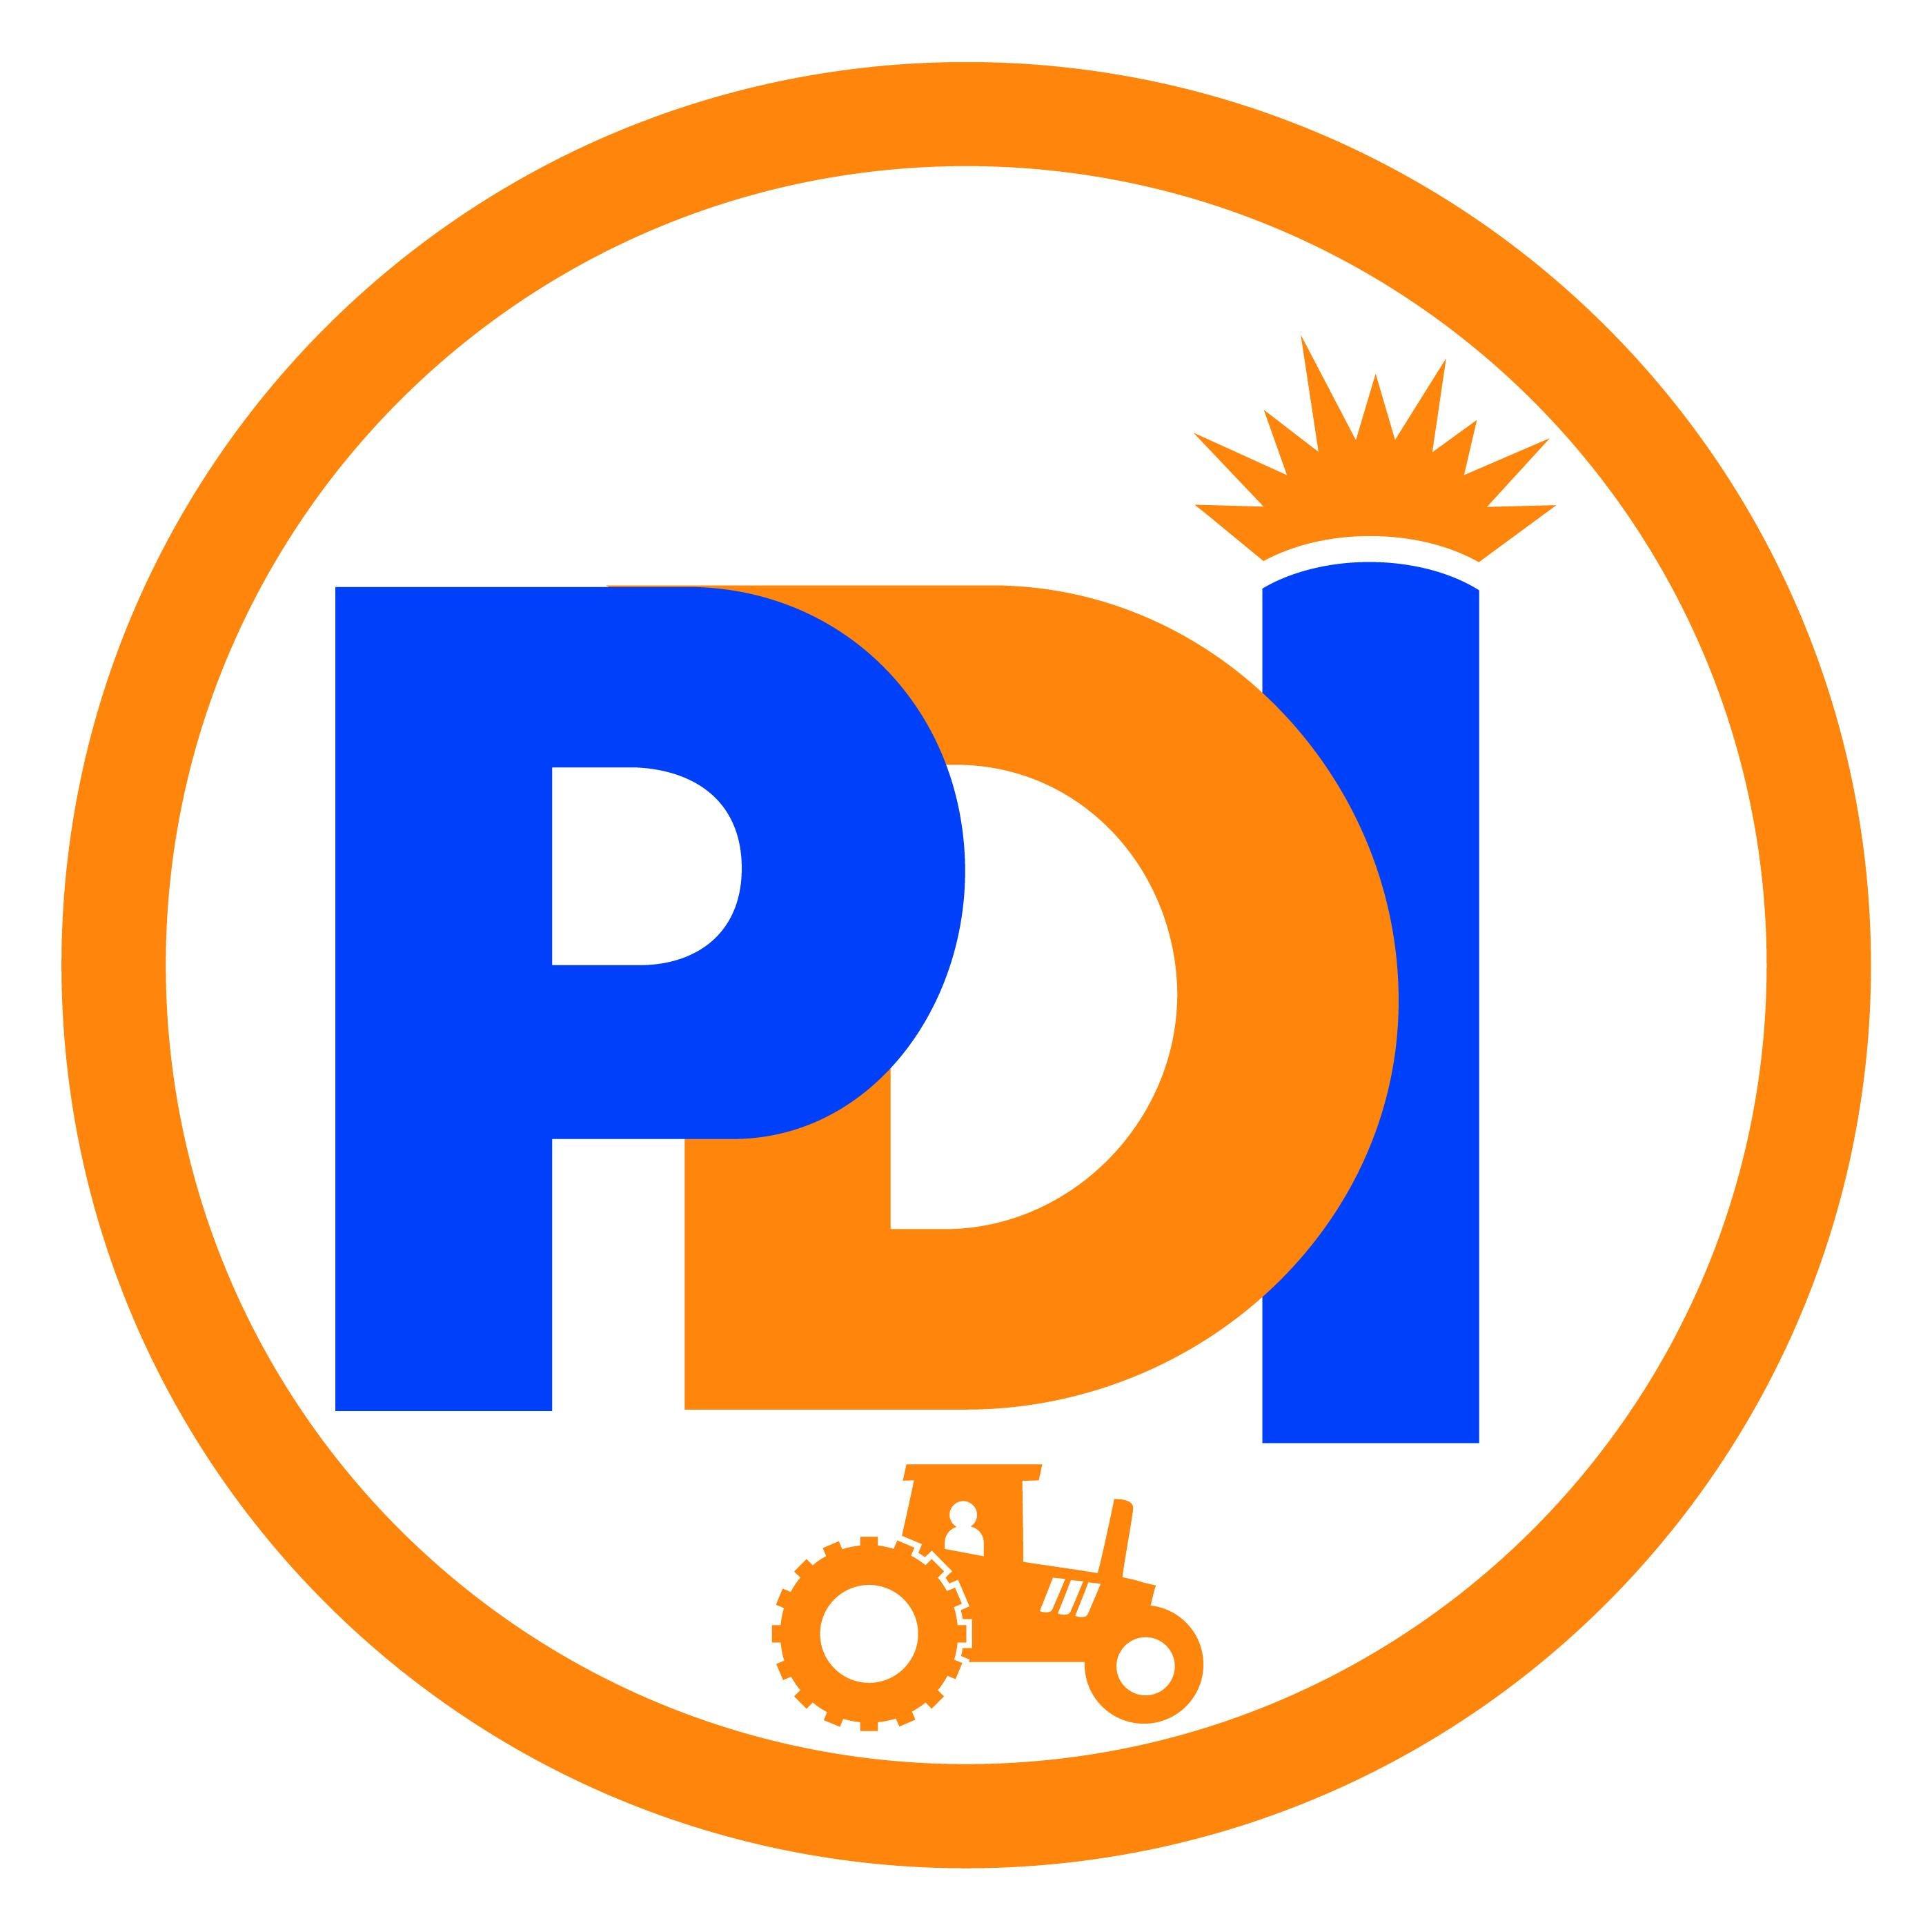 PDI Appoints Antonio Sanchez-Cordero, Senior Vice